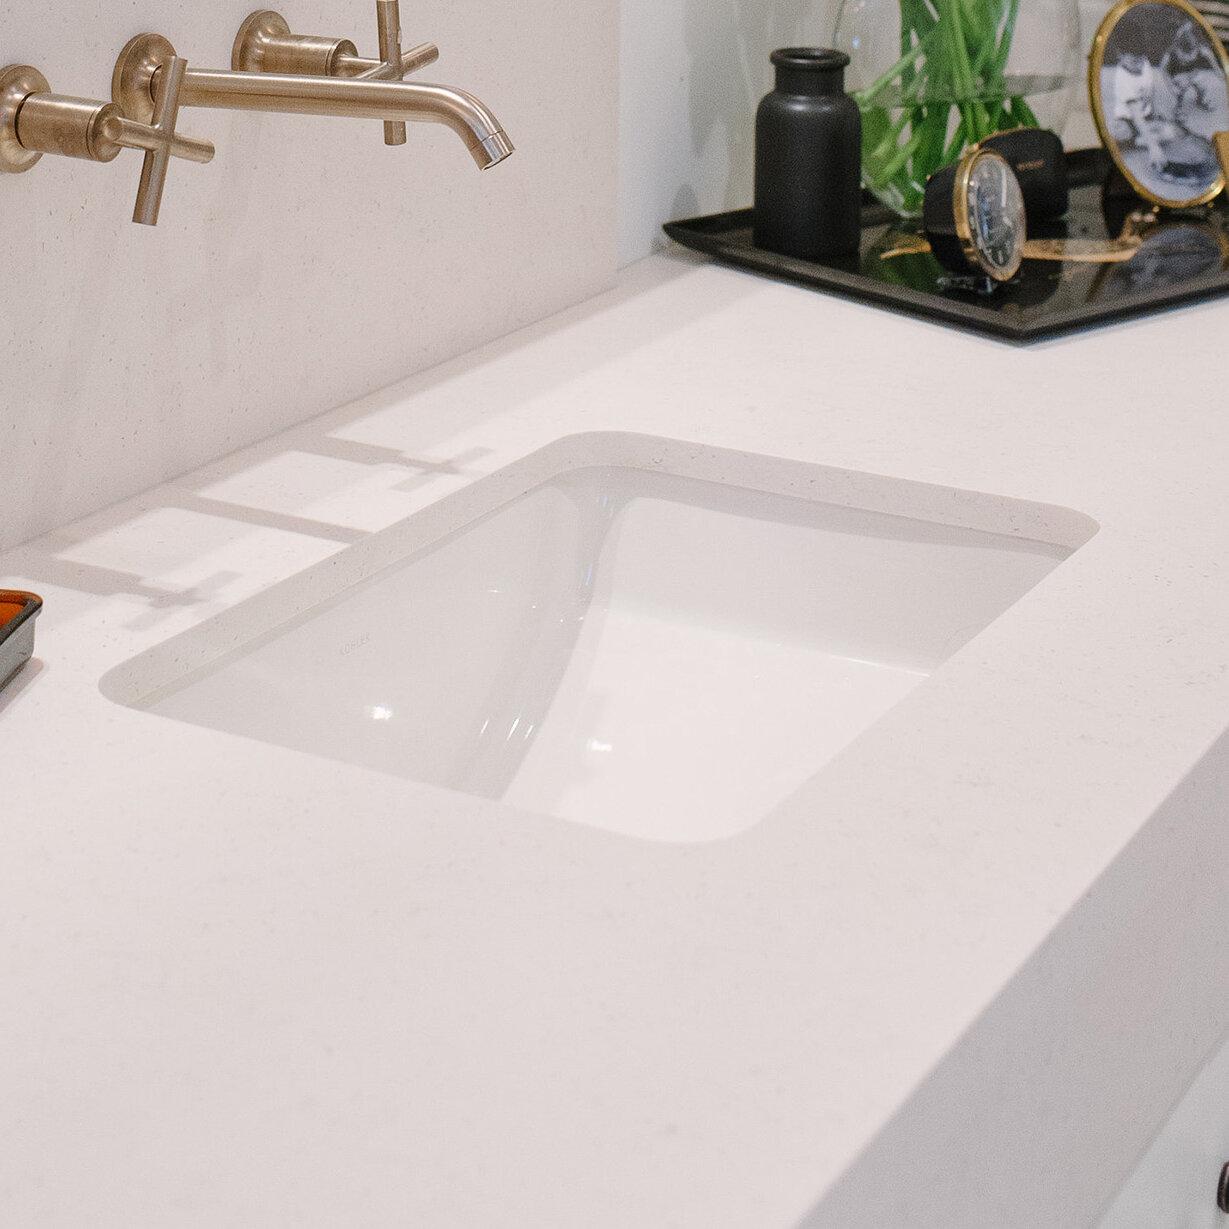 K 2214 05895 kohler ladena ceramic rectangular undermount bathroom sink with overflow reviews wayfair